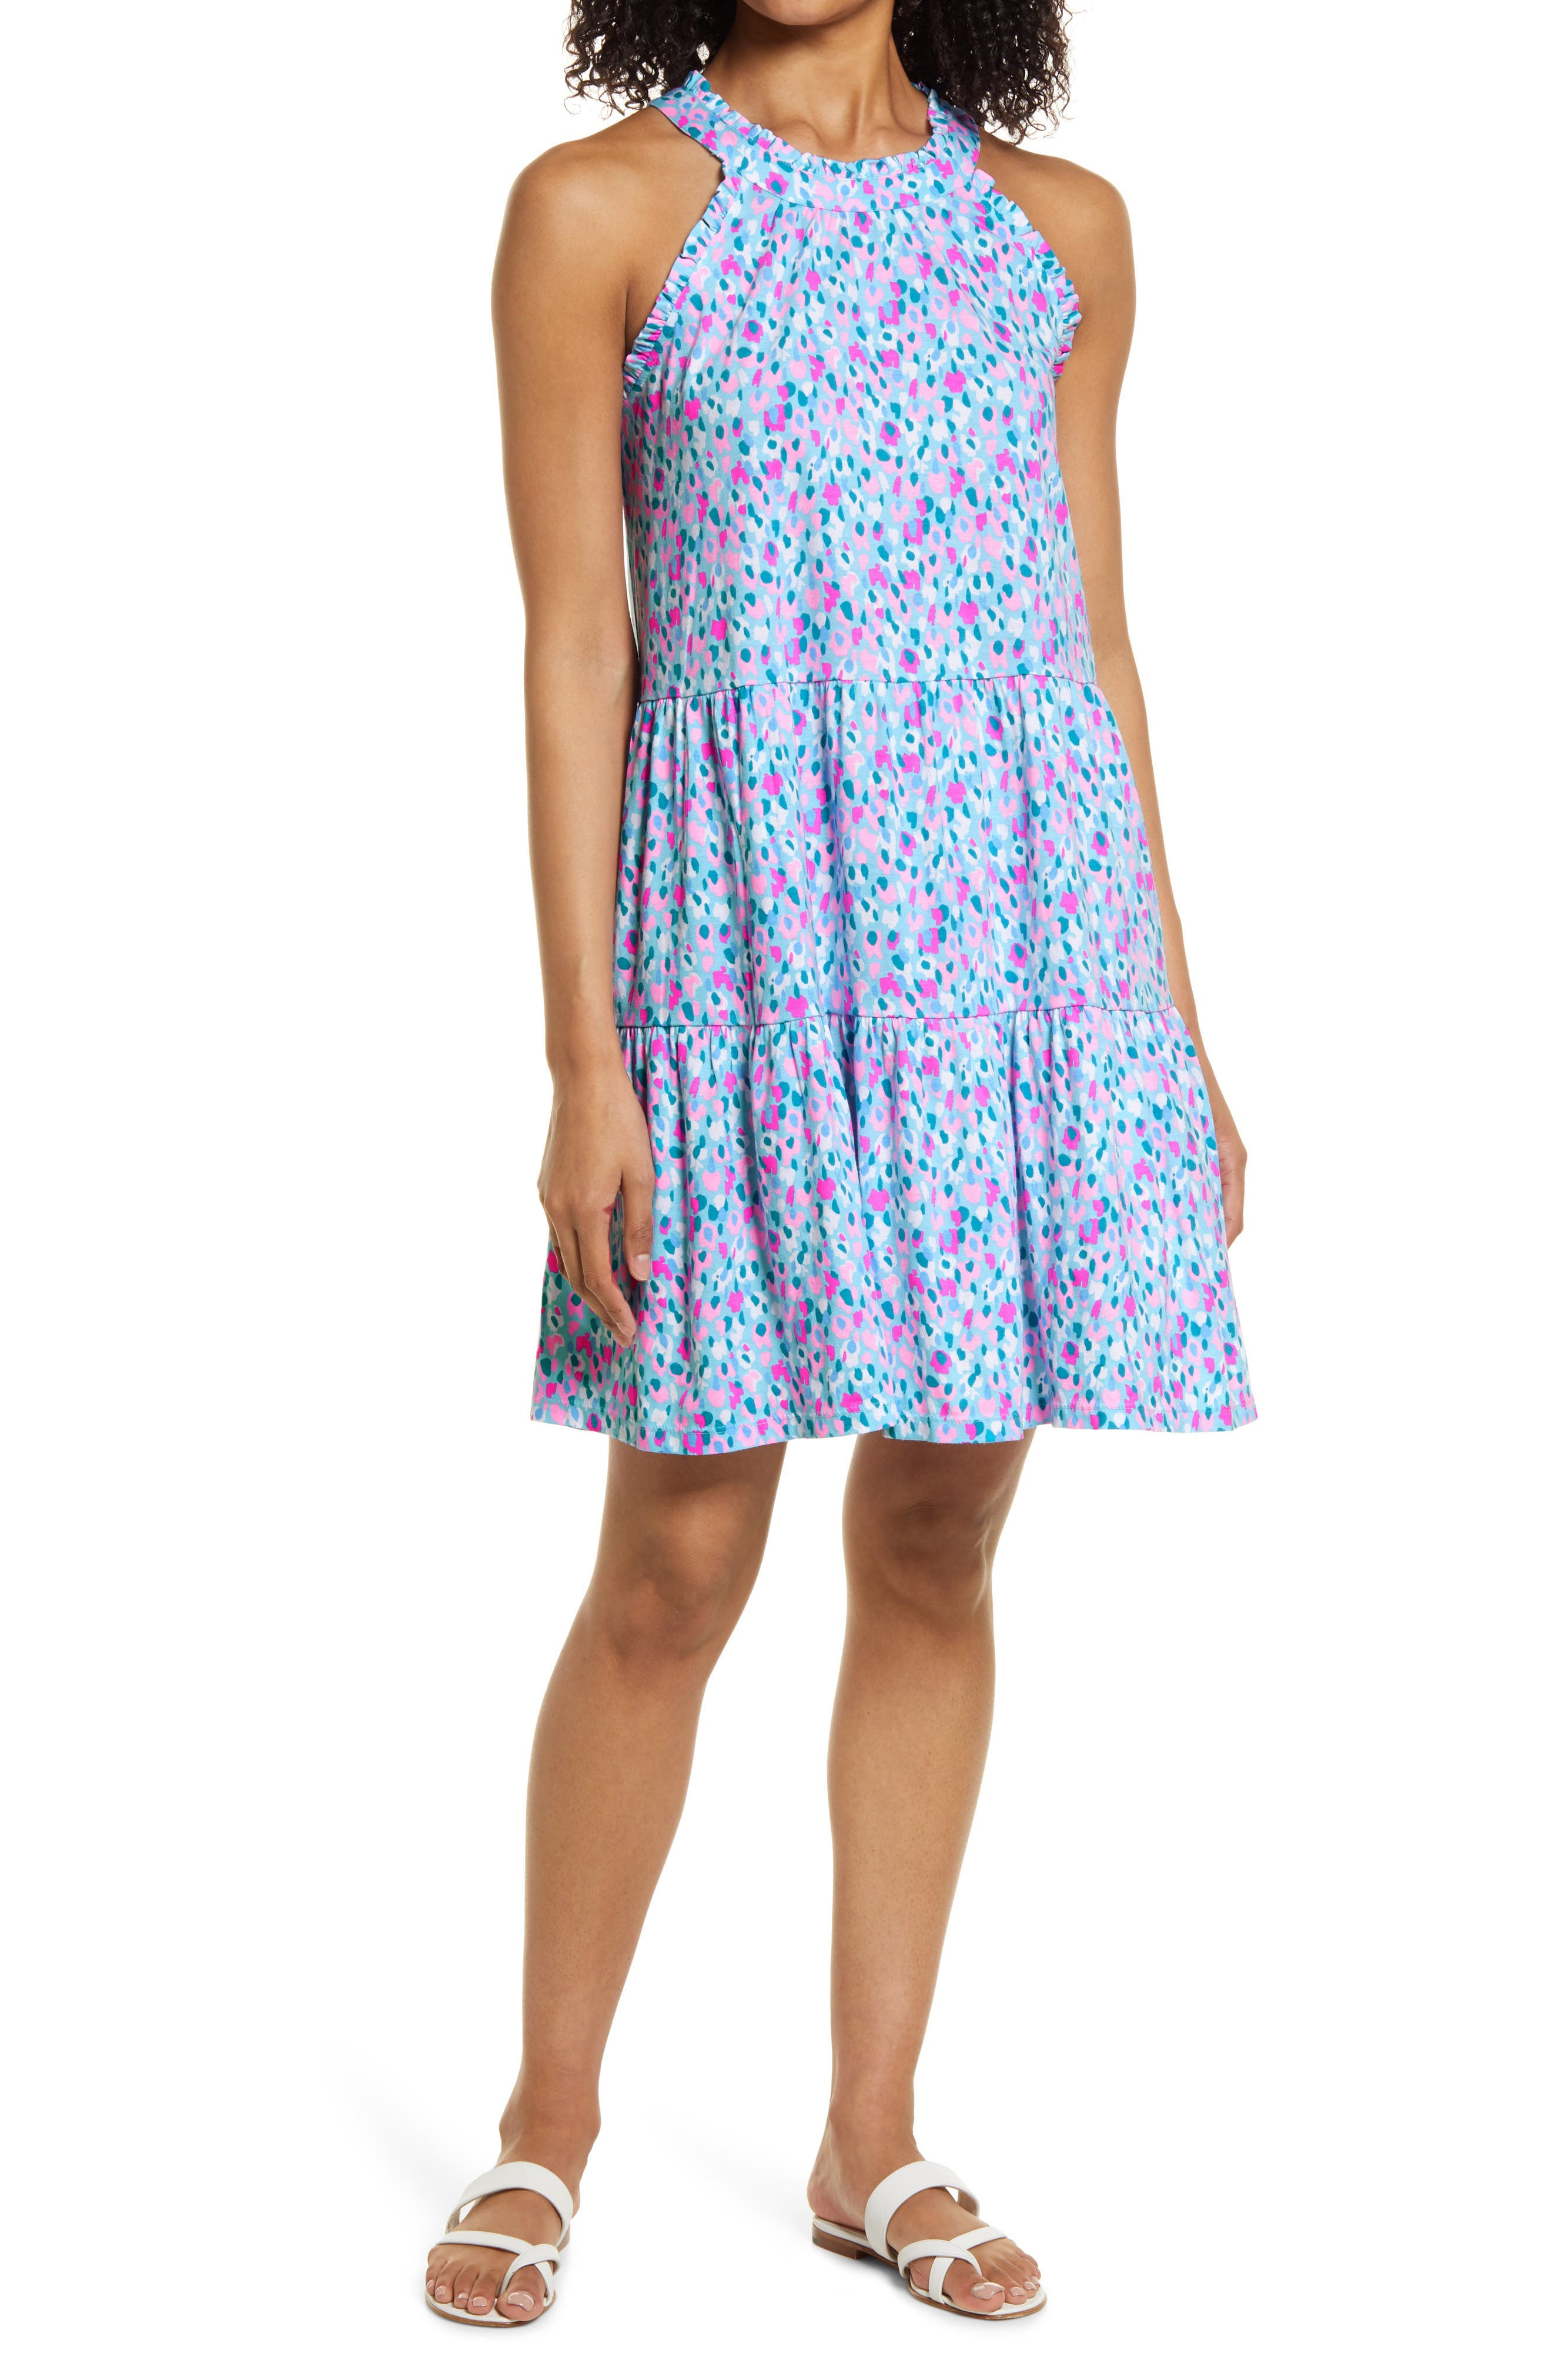 Women's Lilly Pulitzer Jerrica Dot Print Sleeveless Dress